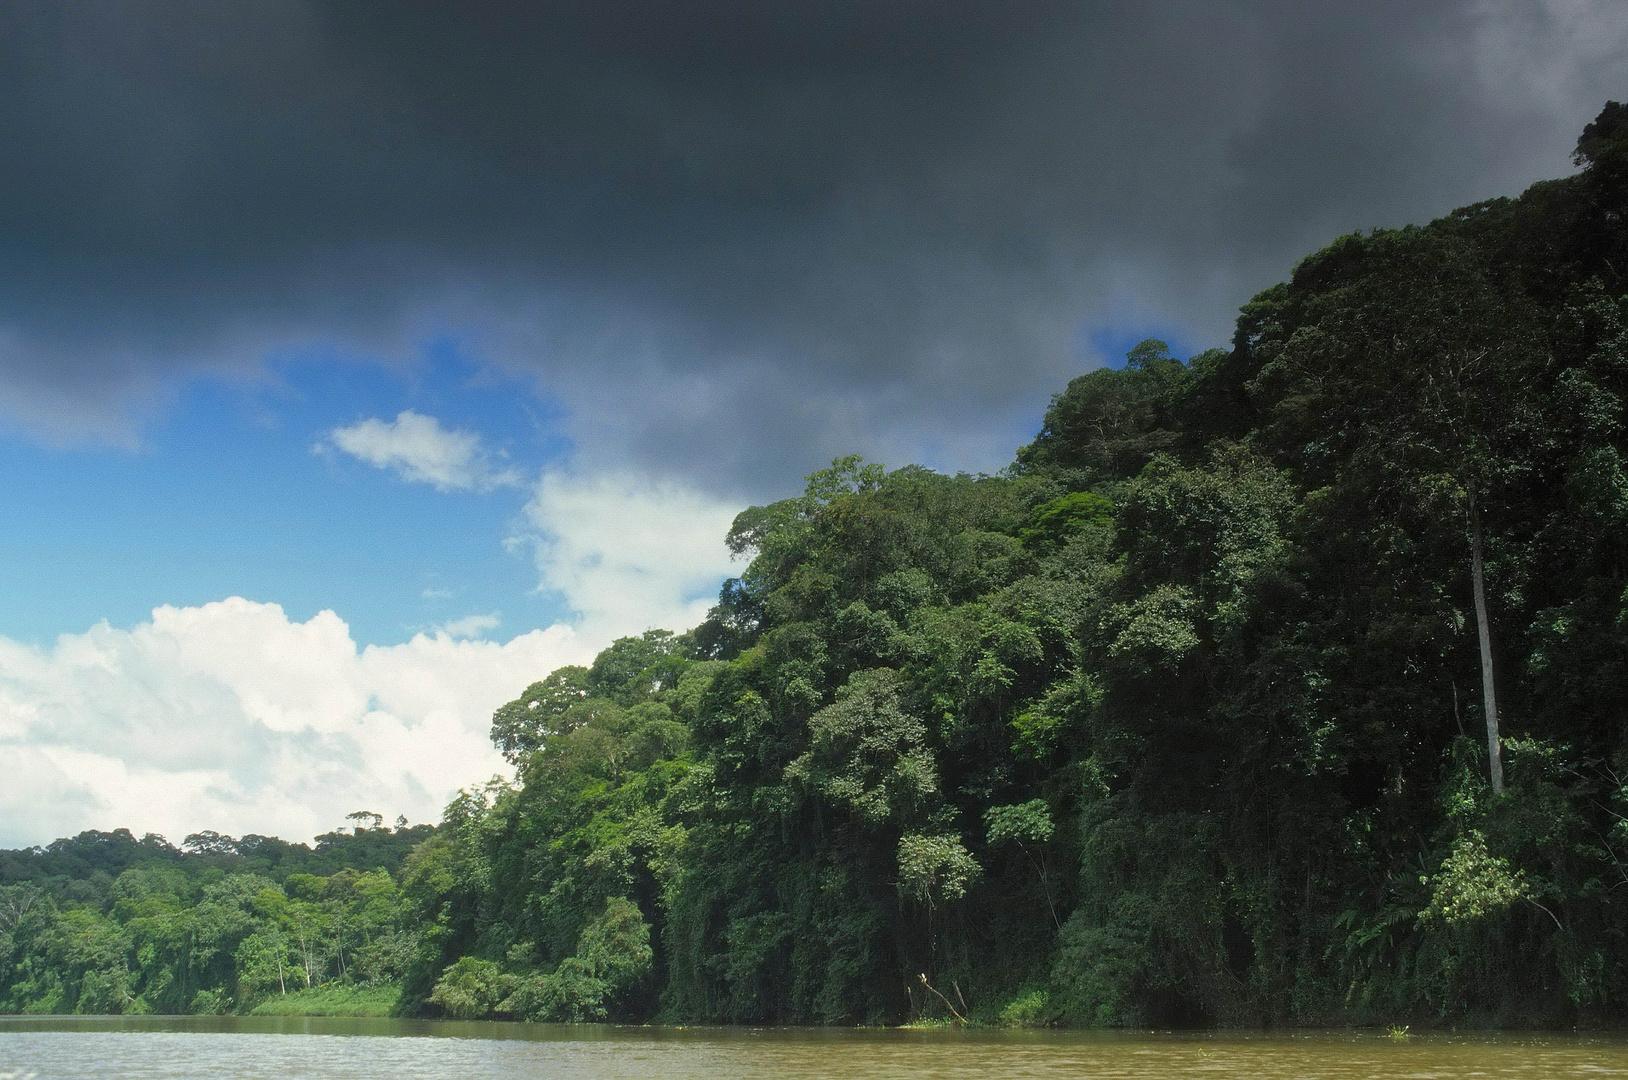 Indio Maiz - Biosphärenreservat